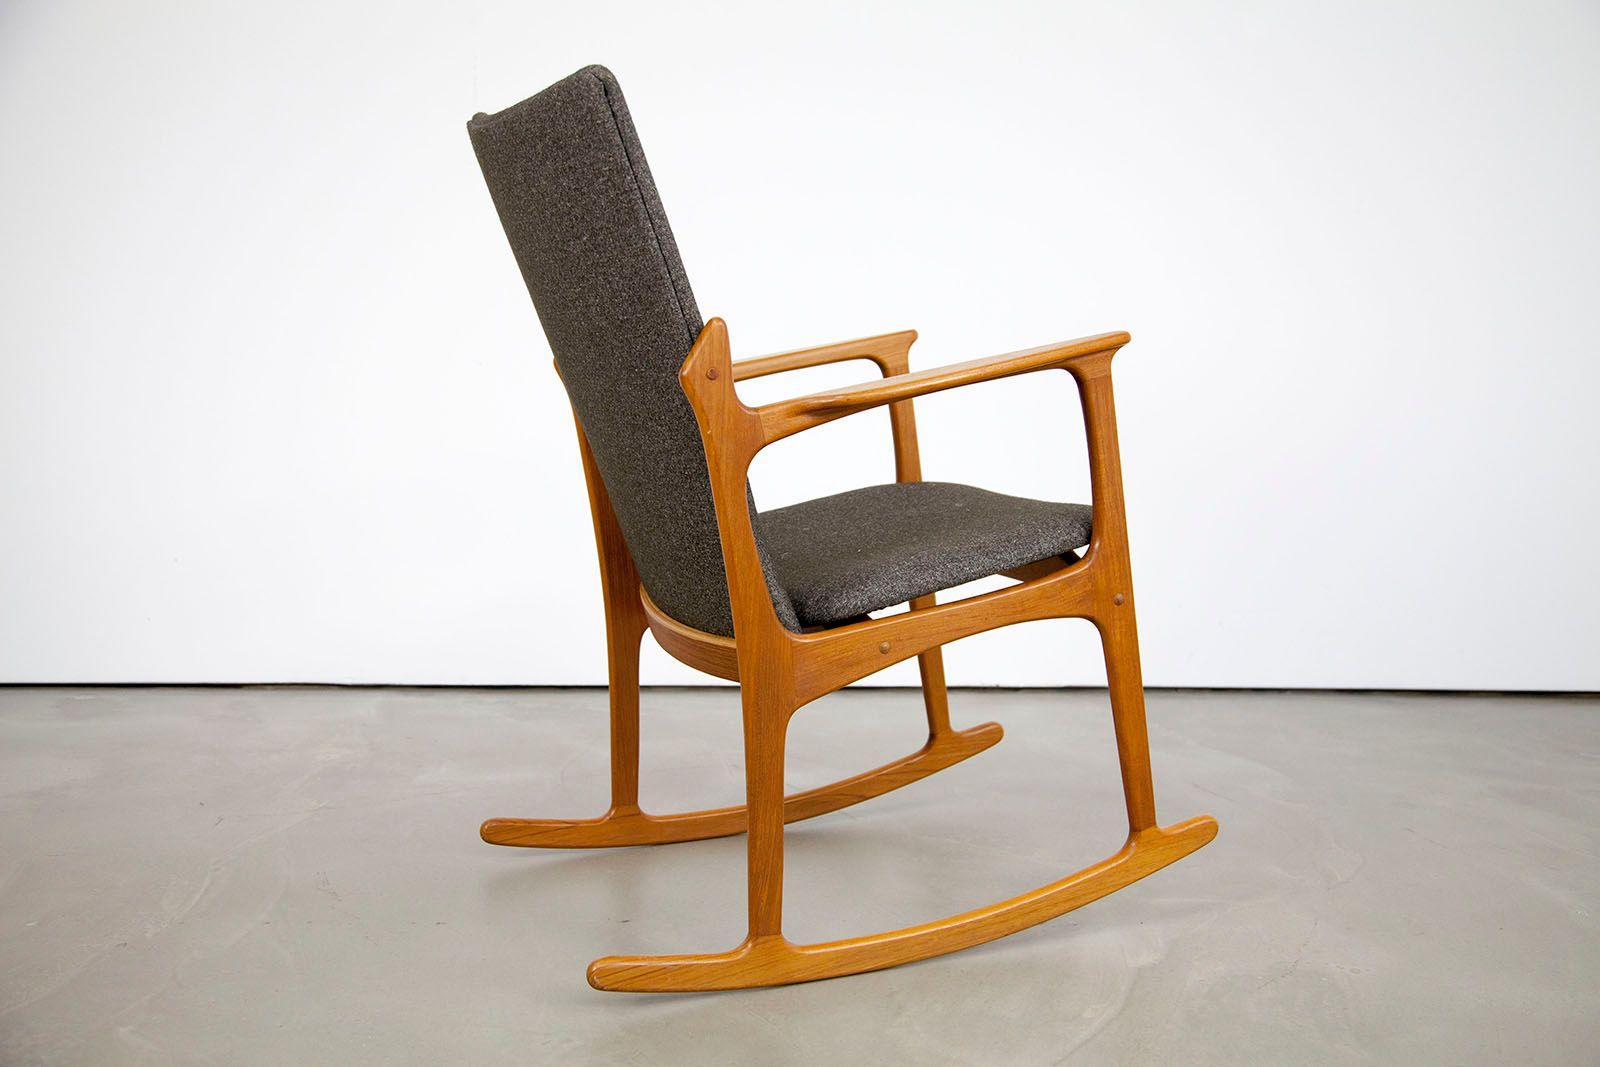 d nischer moderner teakholz schaukelstuhl von vamdrup bei. Black Bedroom Furniture Sets. Home Design Ideas